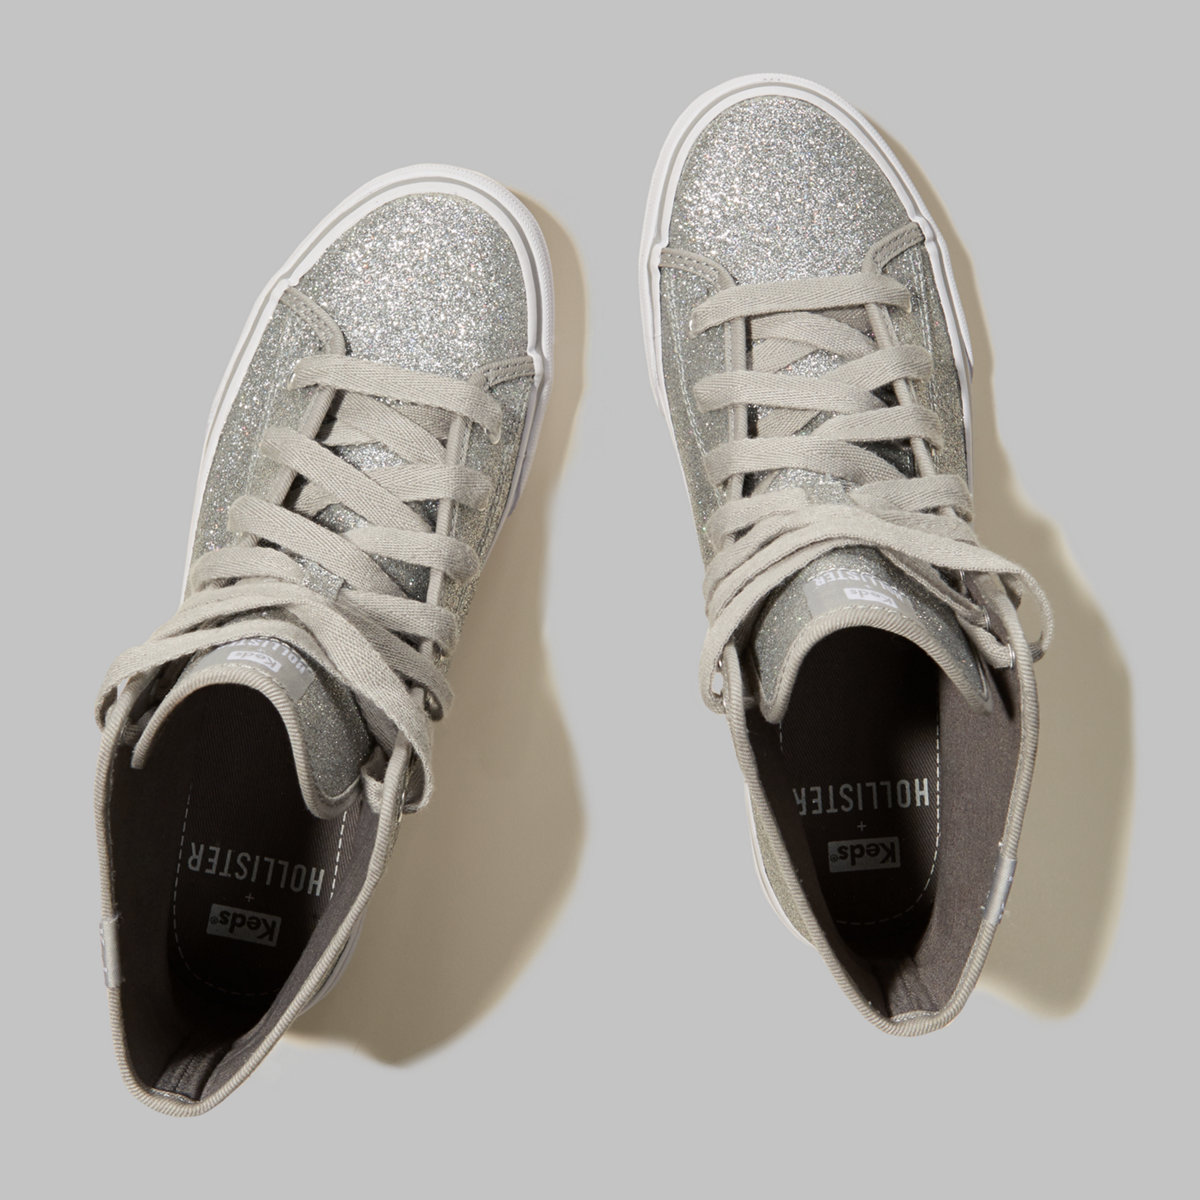 Hollister + Keds Glitter Hi Top Sneakers